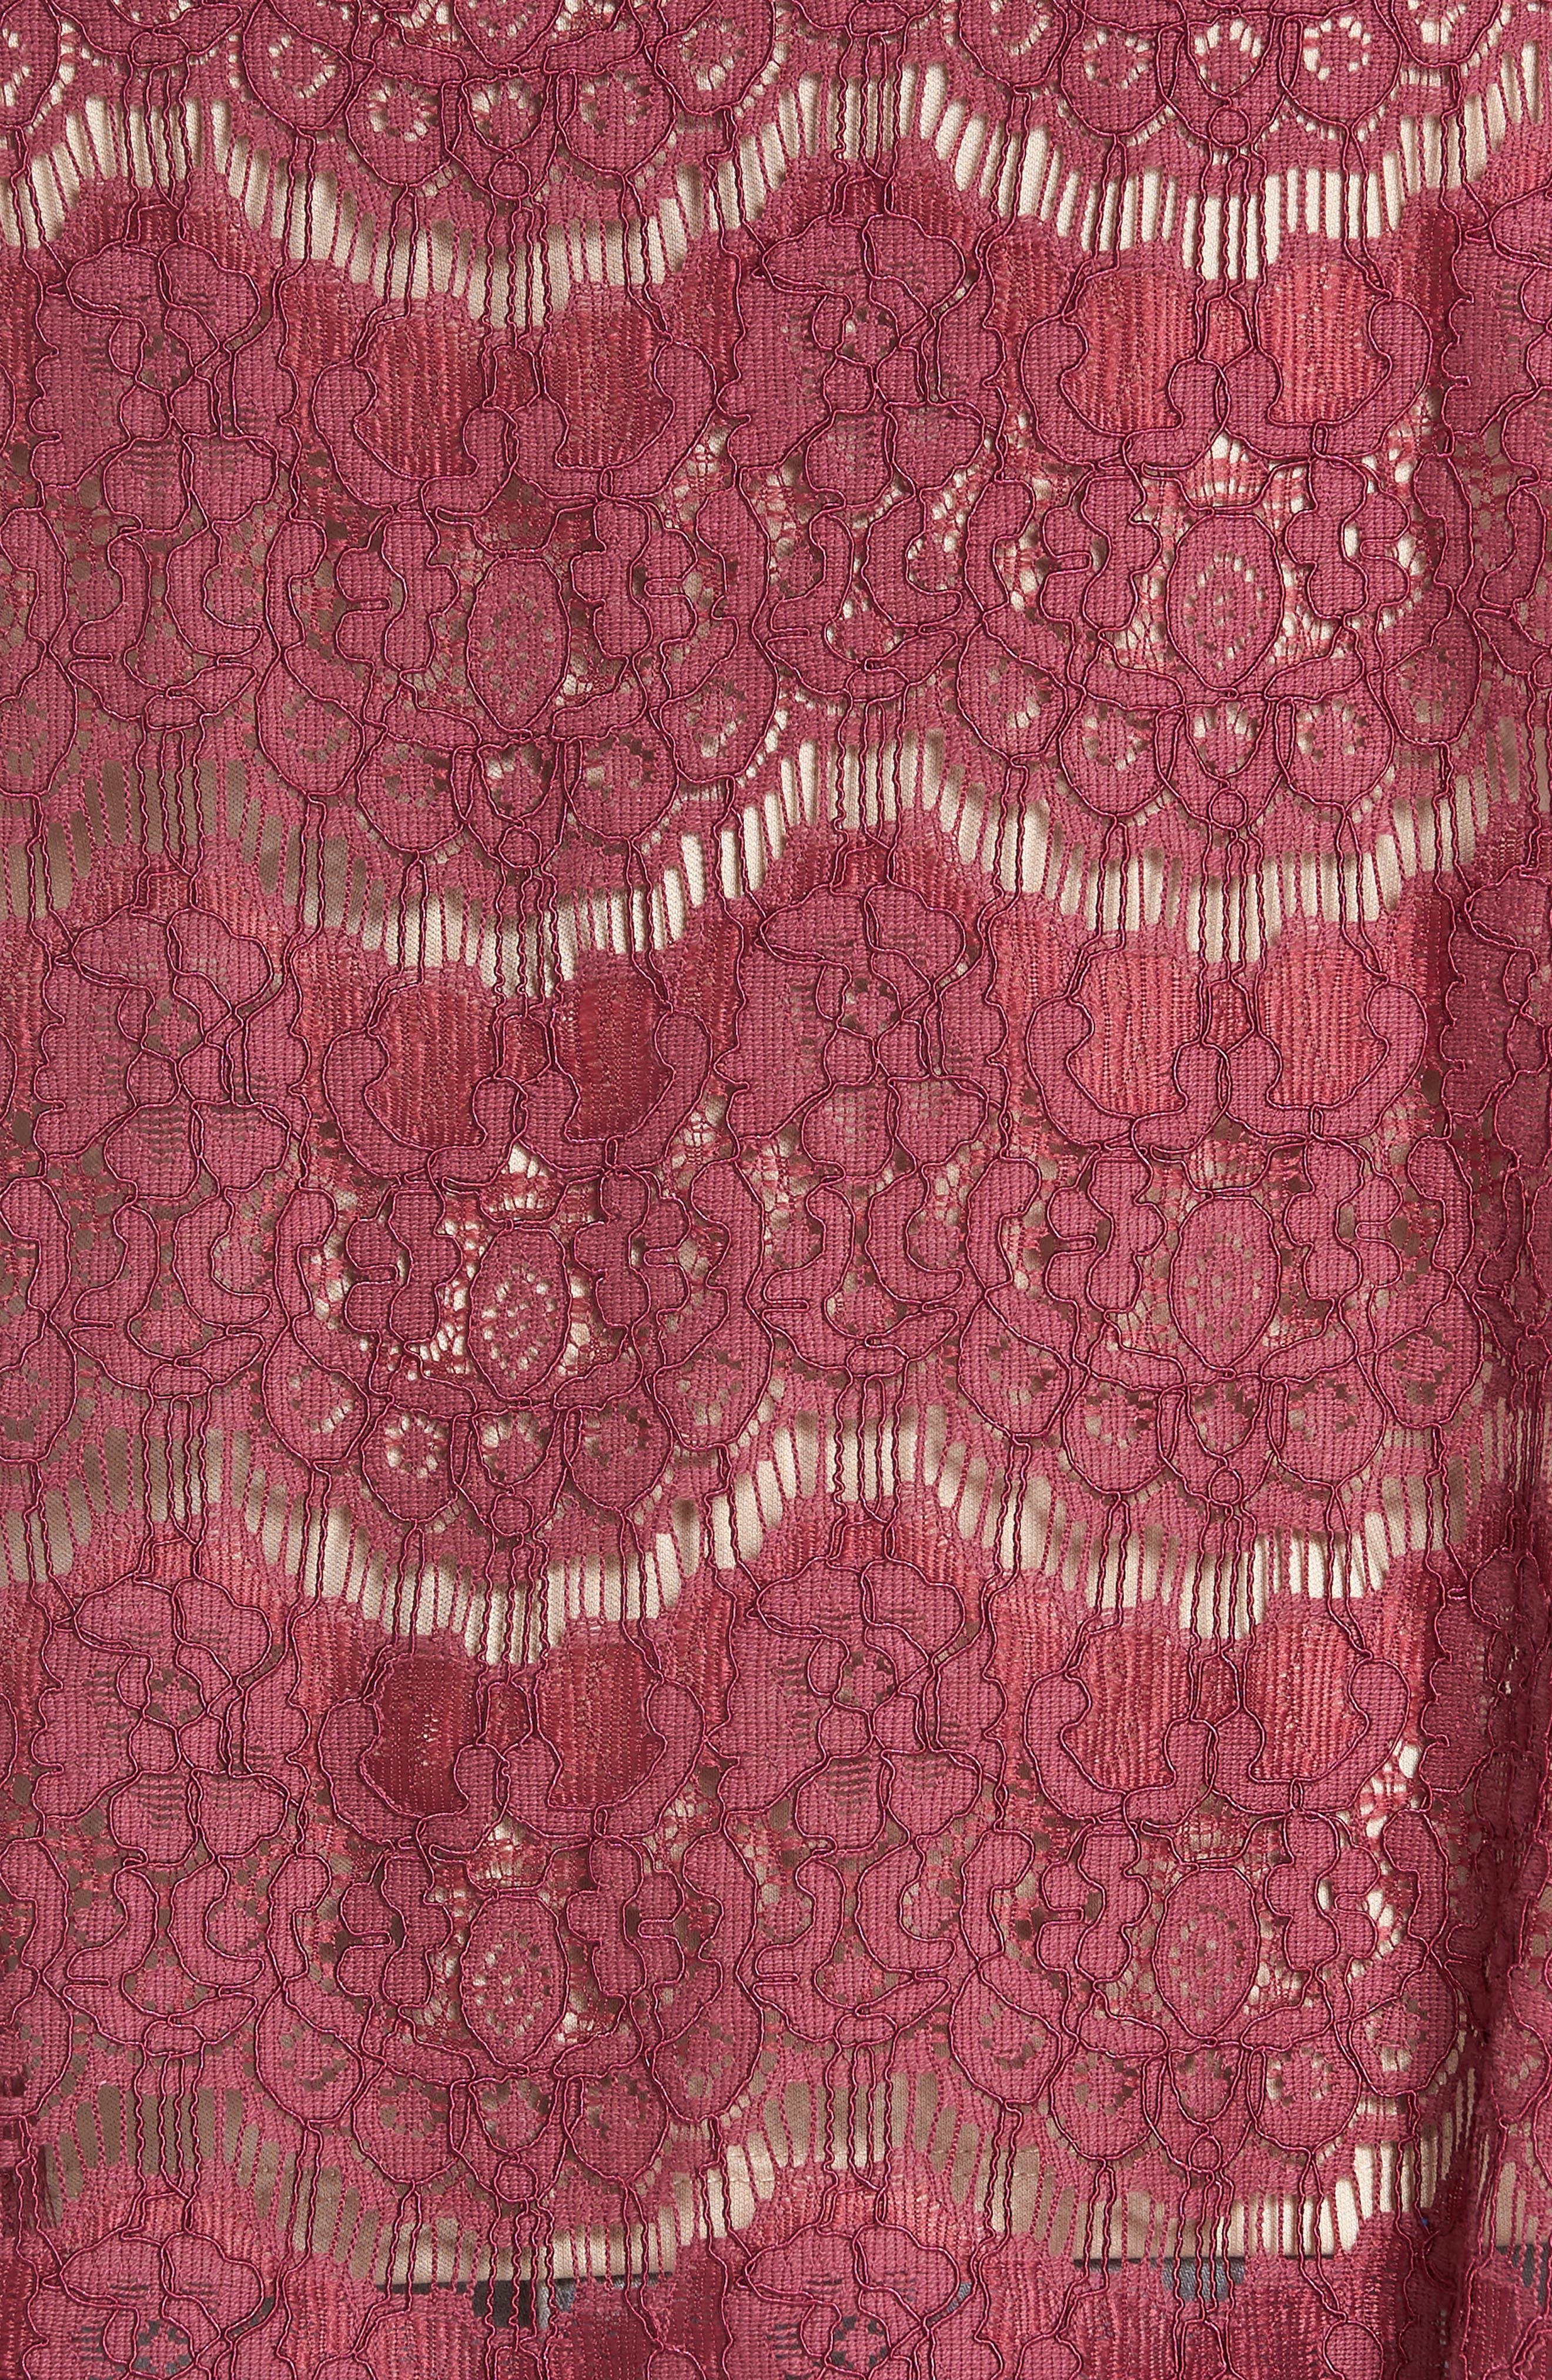 Lace Top,                             Alternate thumbnail 5, color,                             Hawthorn Rose